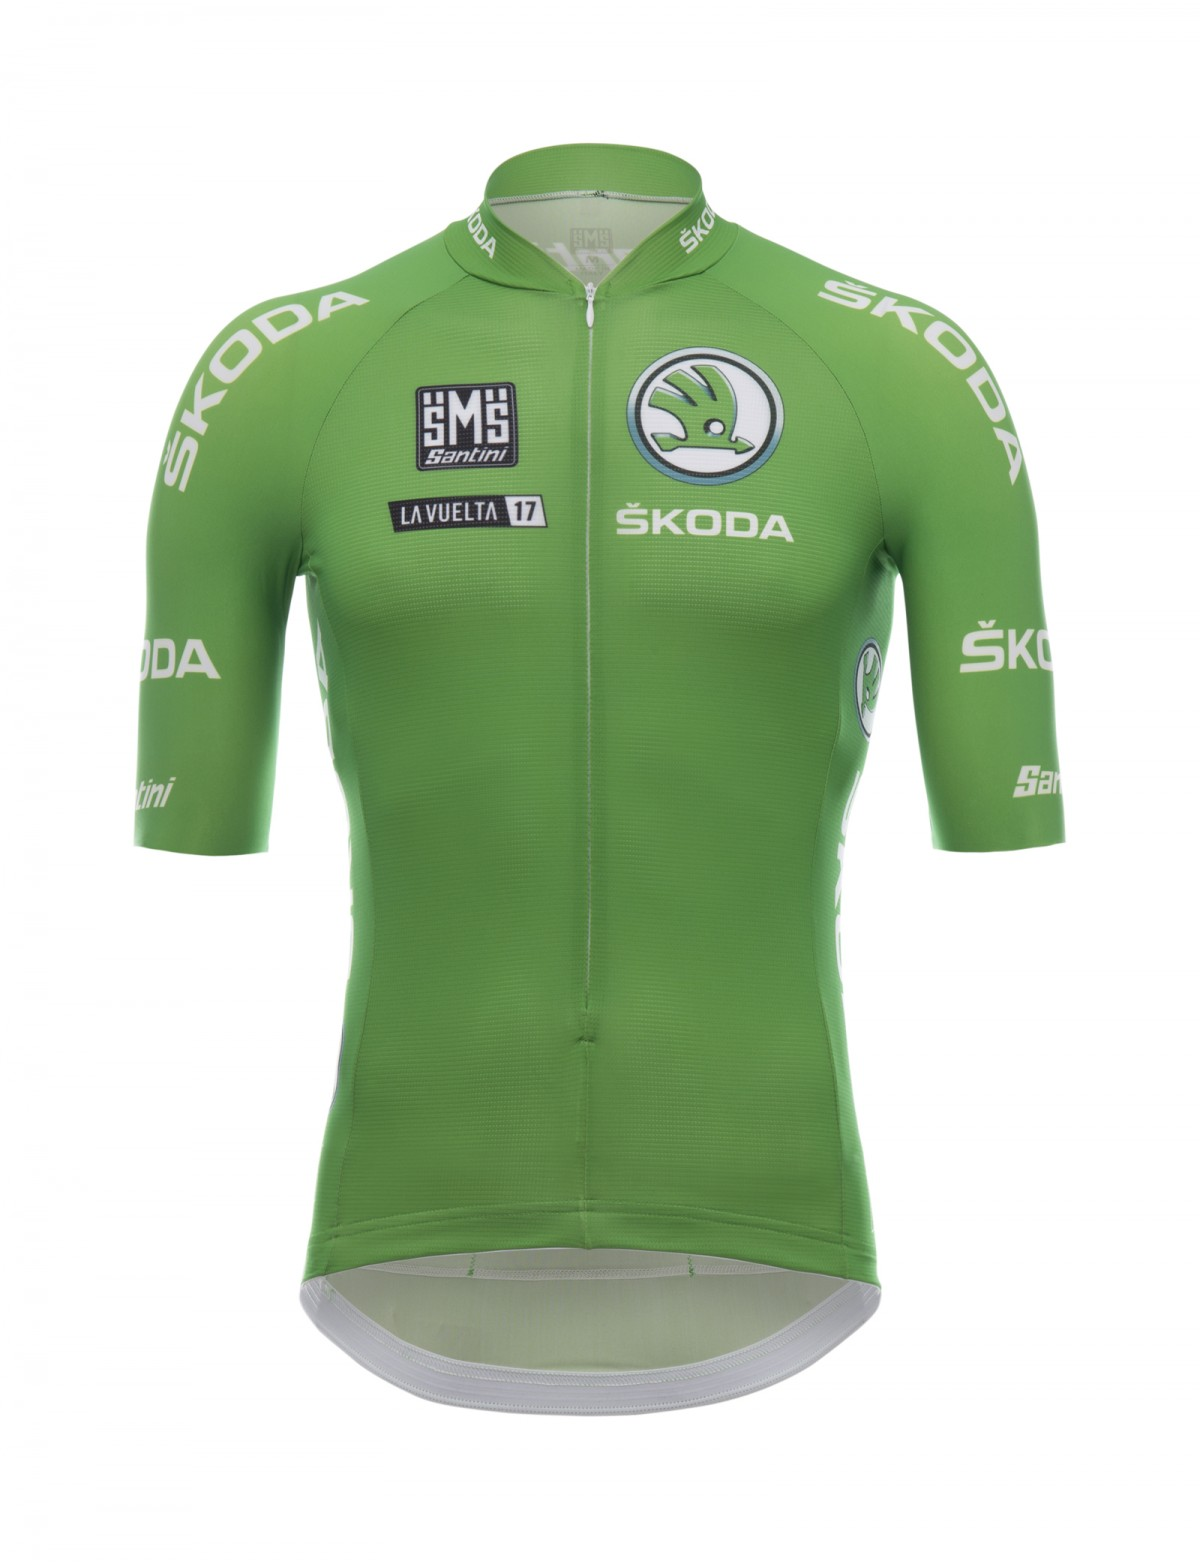 Vuelta maglia verde